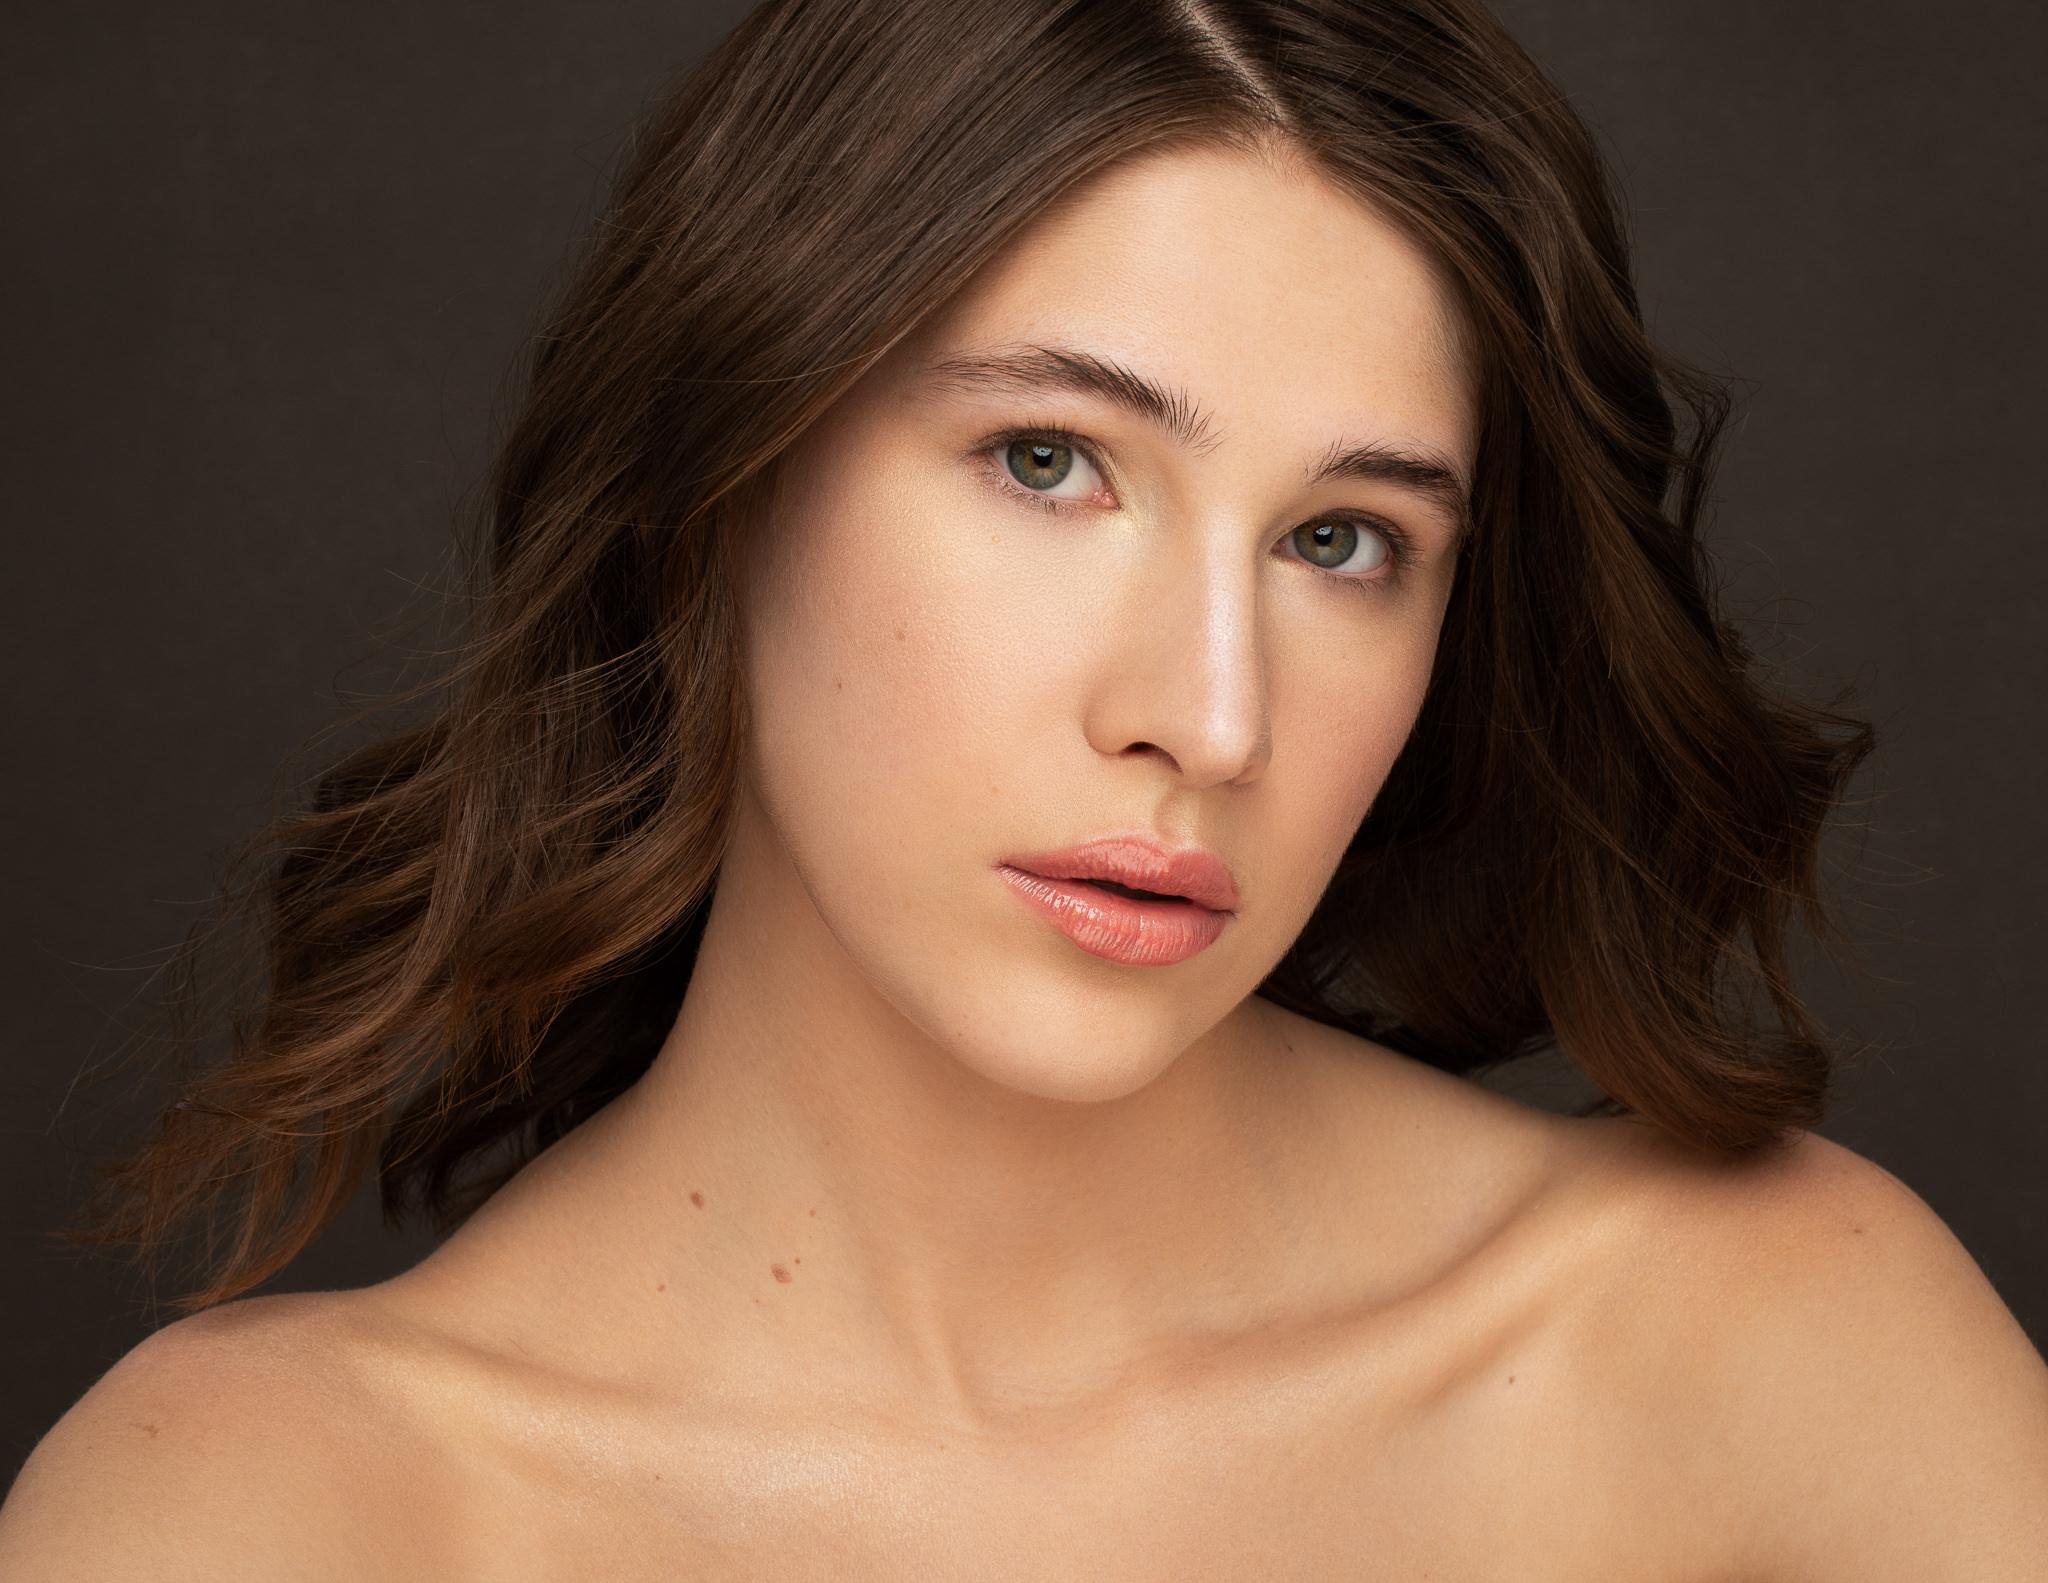 Chicago Beauty Photographer Patrick Simmons-2.jpg